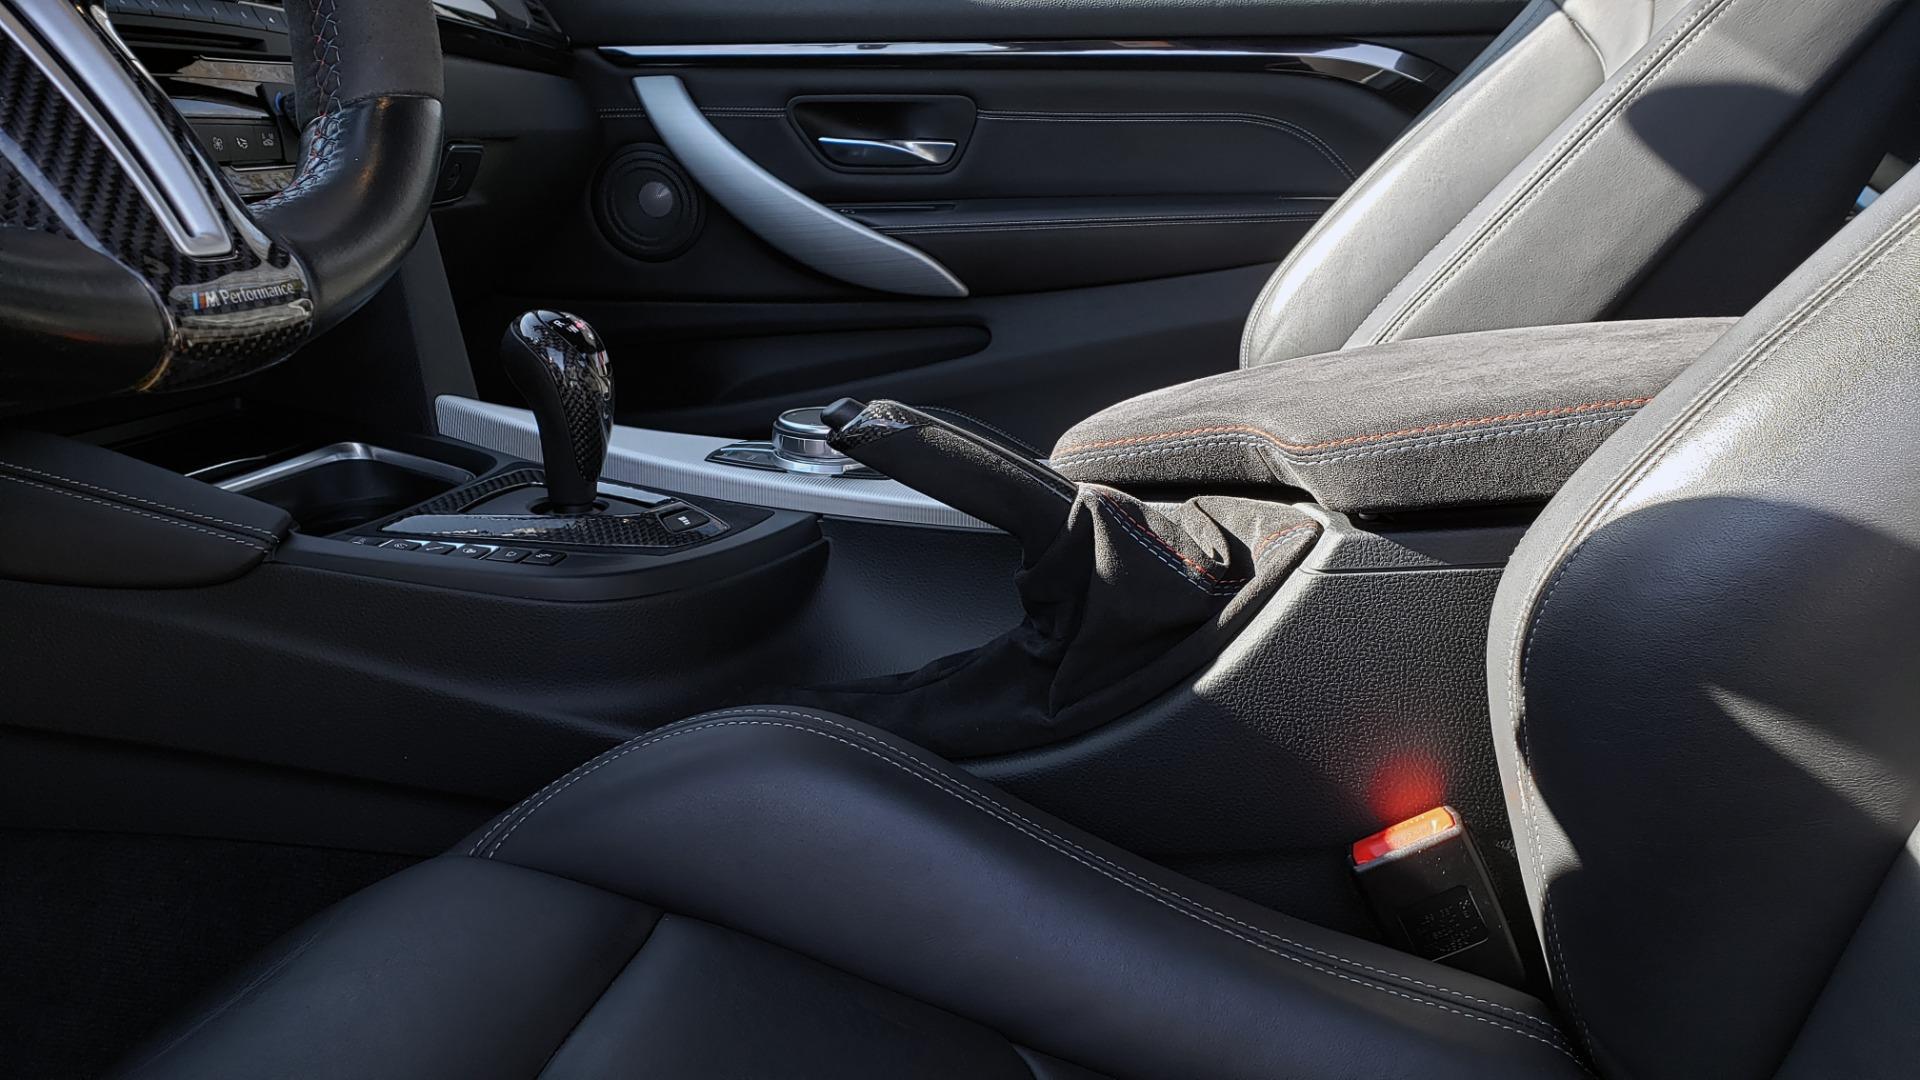 Used 2018 BMW M4 COMP PKG / EXEC / M-DRIVER / PARK CNTRL / ACTIVE BLIND SPOT for sale Sold at Formula Imports in Charlotte NC 28227 51